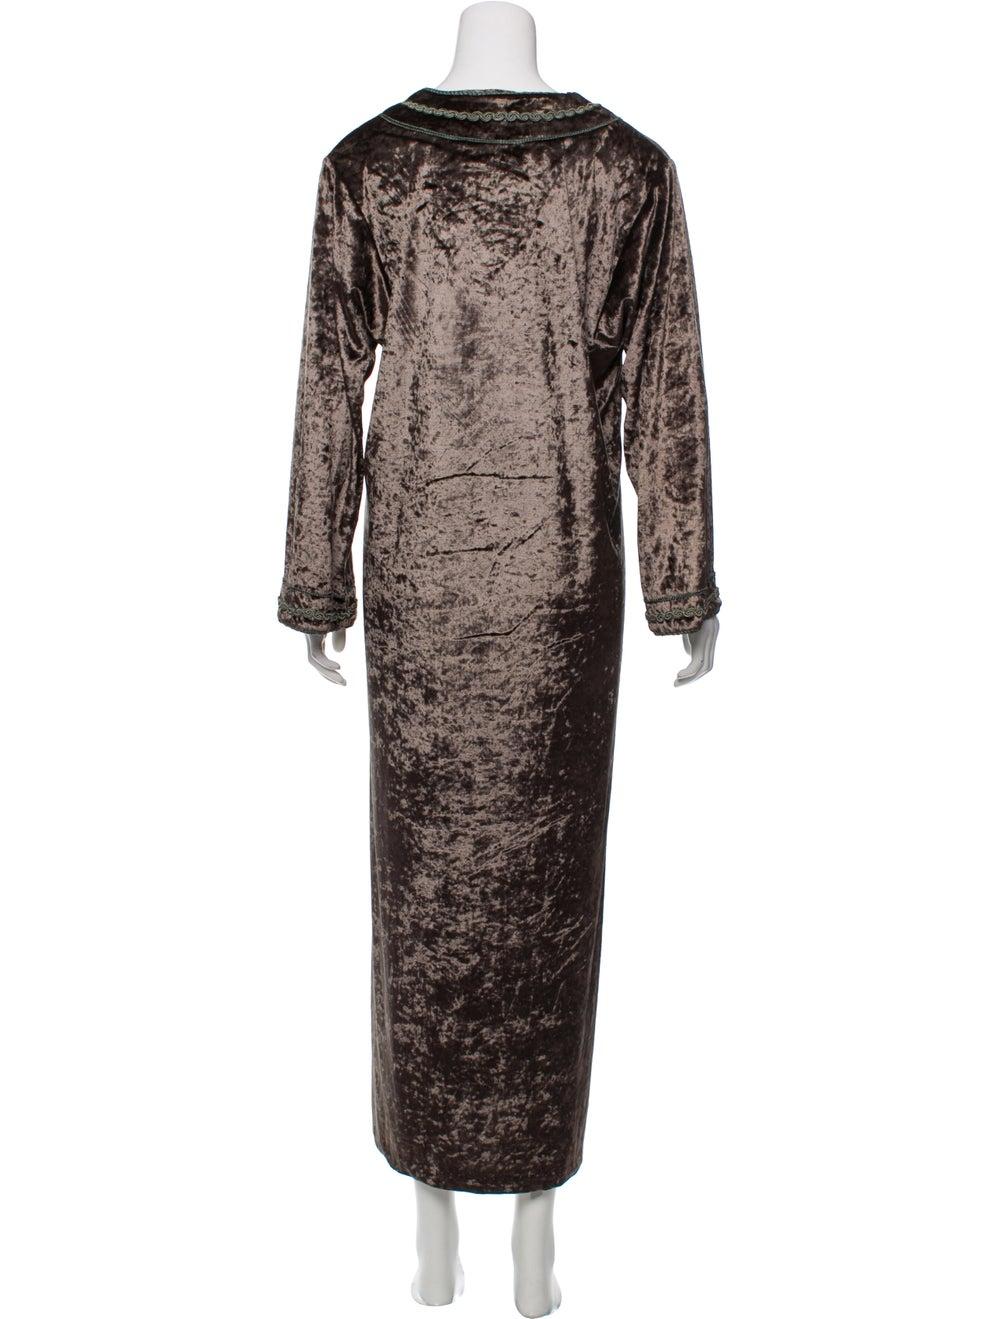 Oscar de la Renta Velvet Maxi Dress Green - image 3